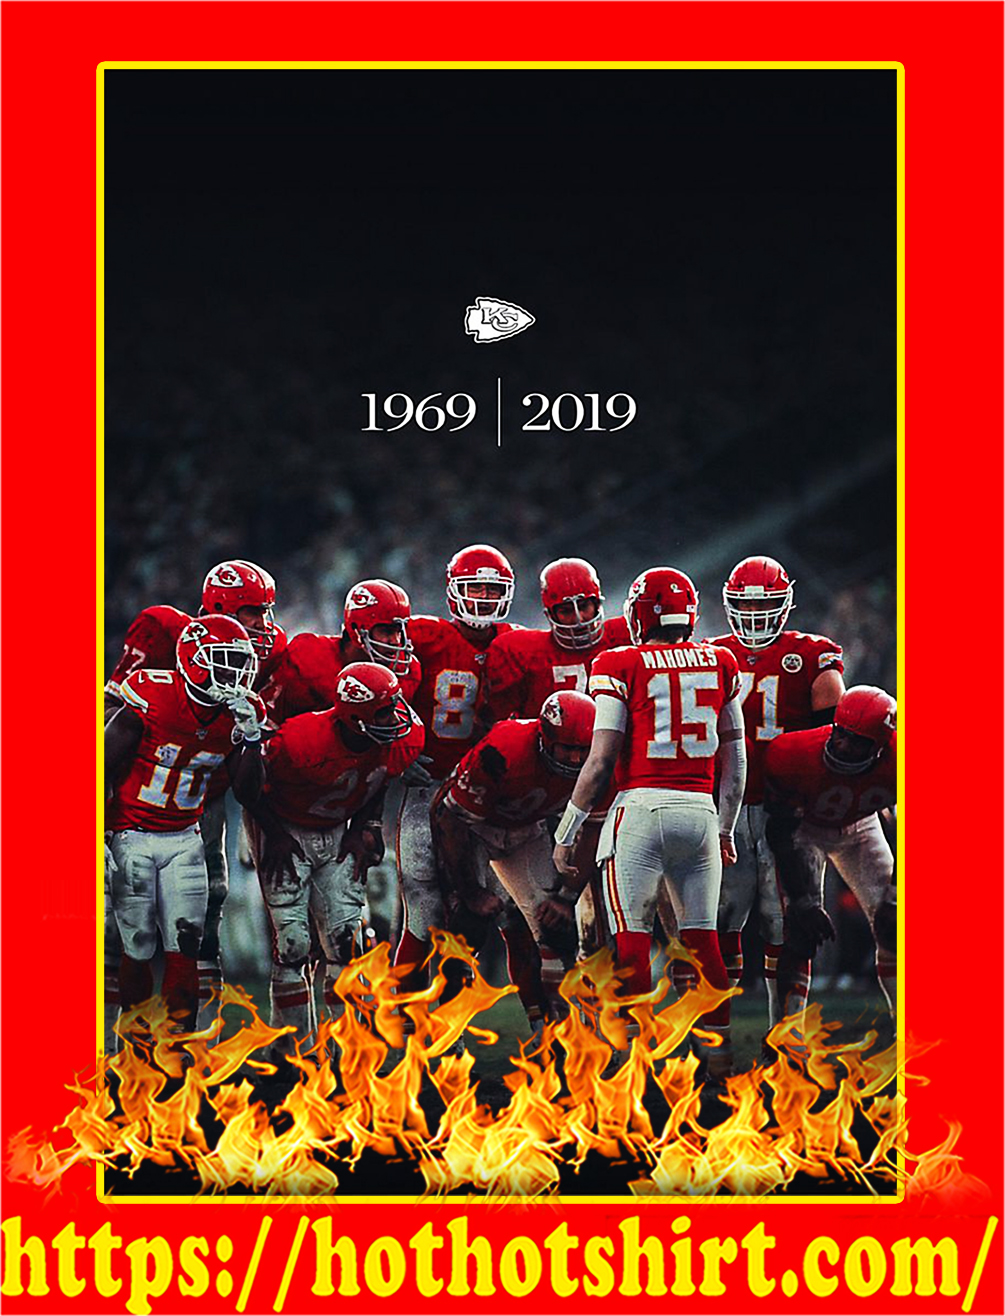 Kansas City Chiefs 1969 2019 Super Bowl Champions Poster - A4